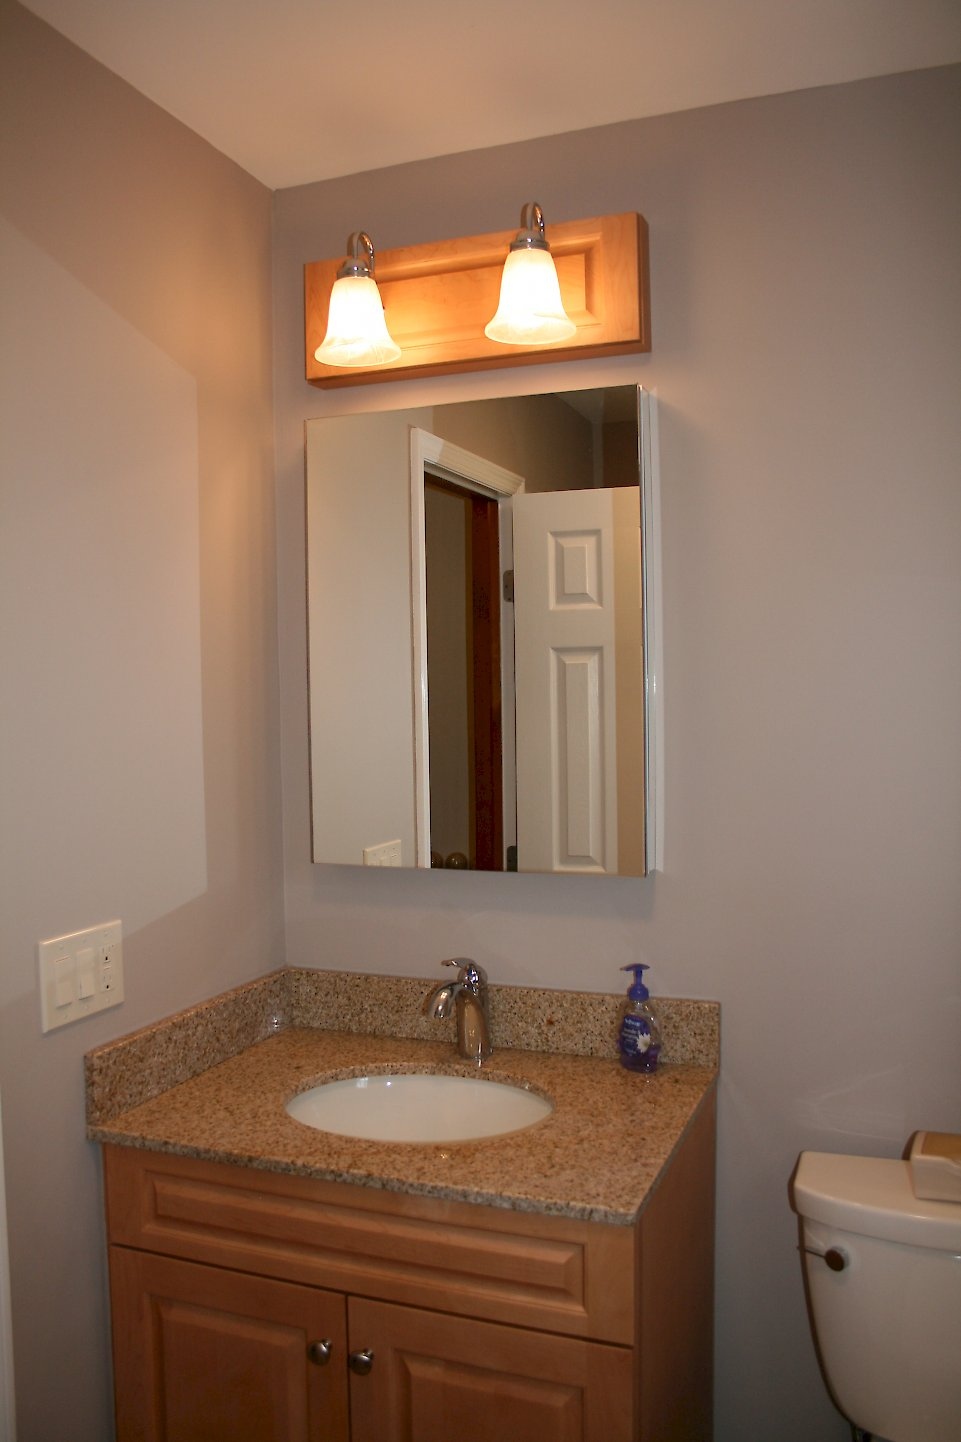 American Archetype categorized under Traditional Bathroom Portfolio.